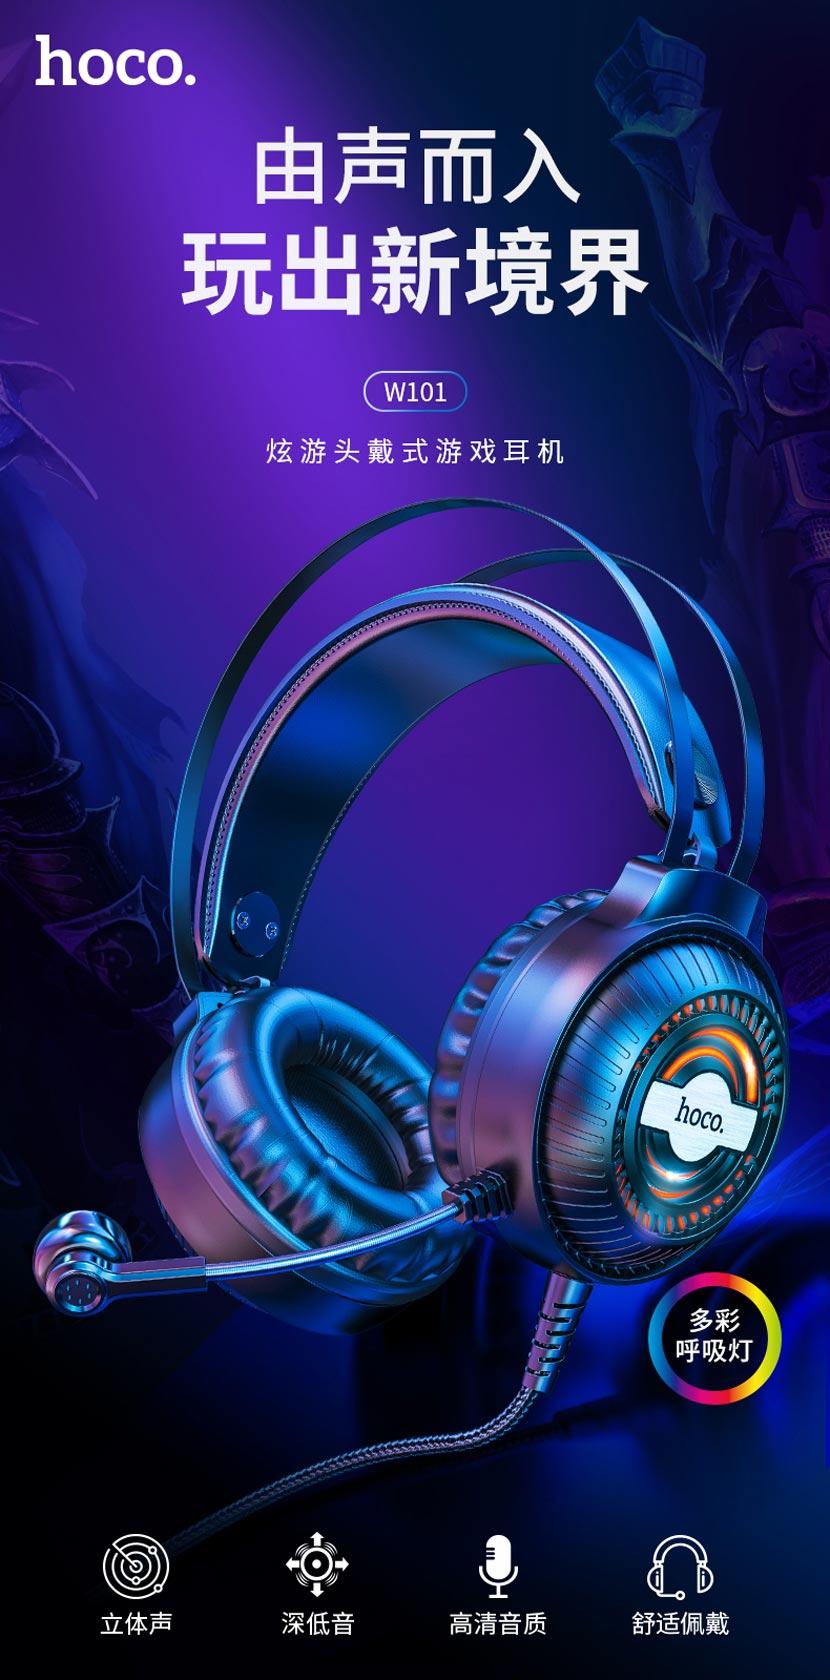 hoco news w101 streamer gaming headphones cn